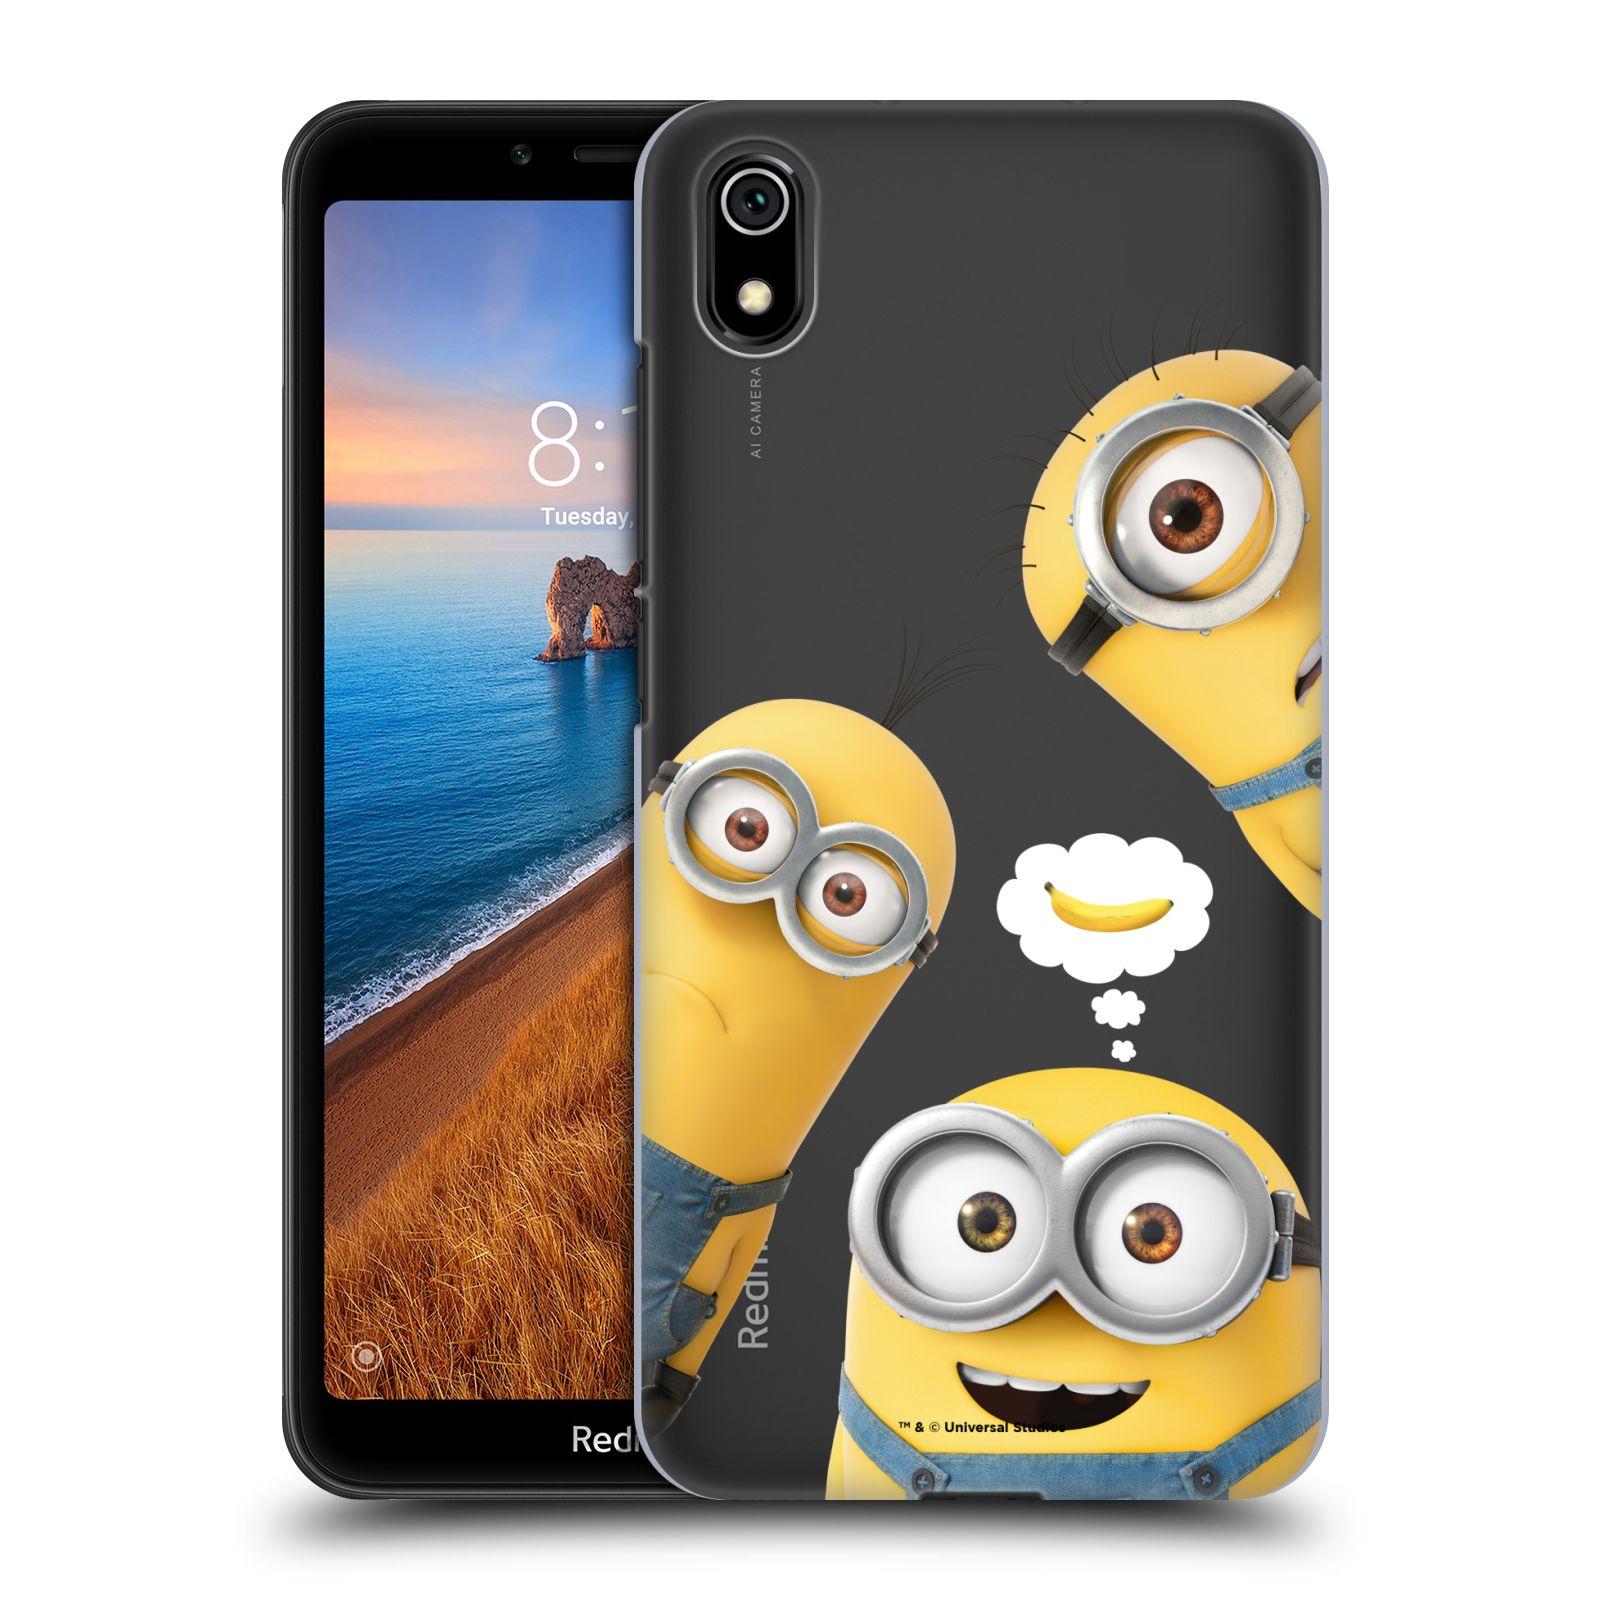 Plastové pouzdro na mobil Xiaomi Redmi 7A - Head Case - Mimoni Banana z filmu Já, padouch - Despicable Me